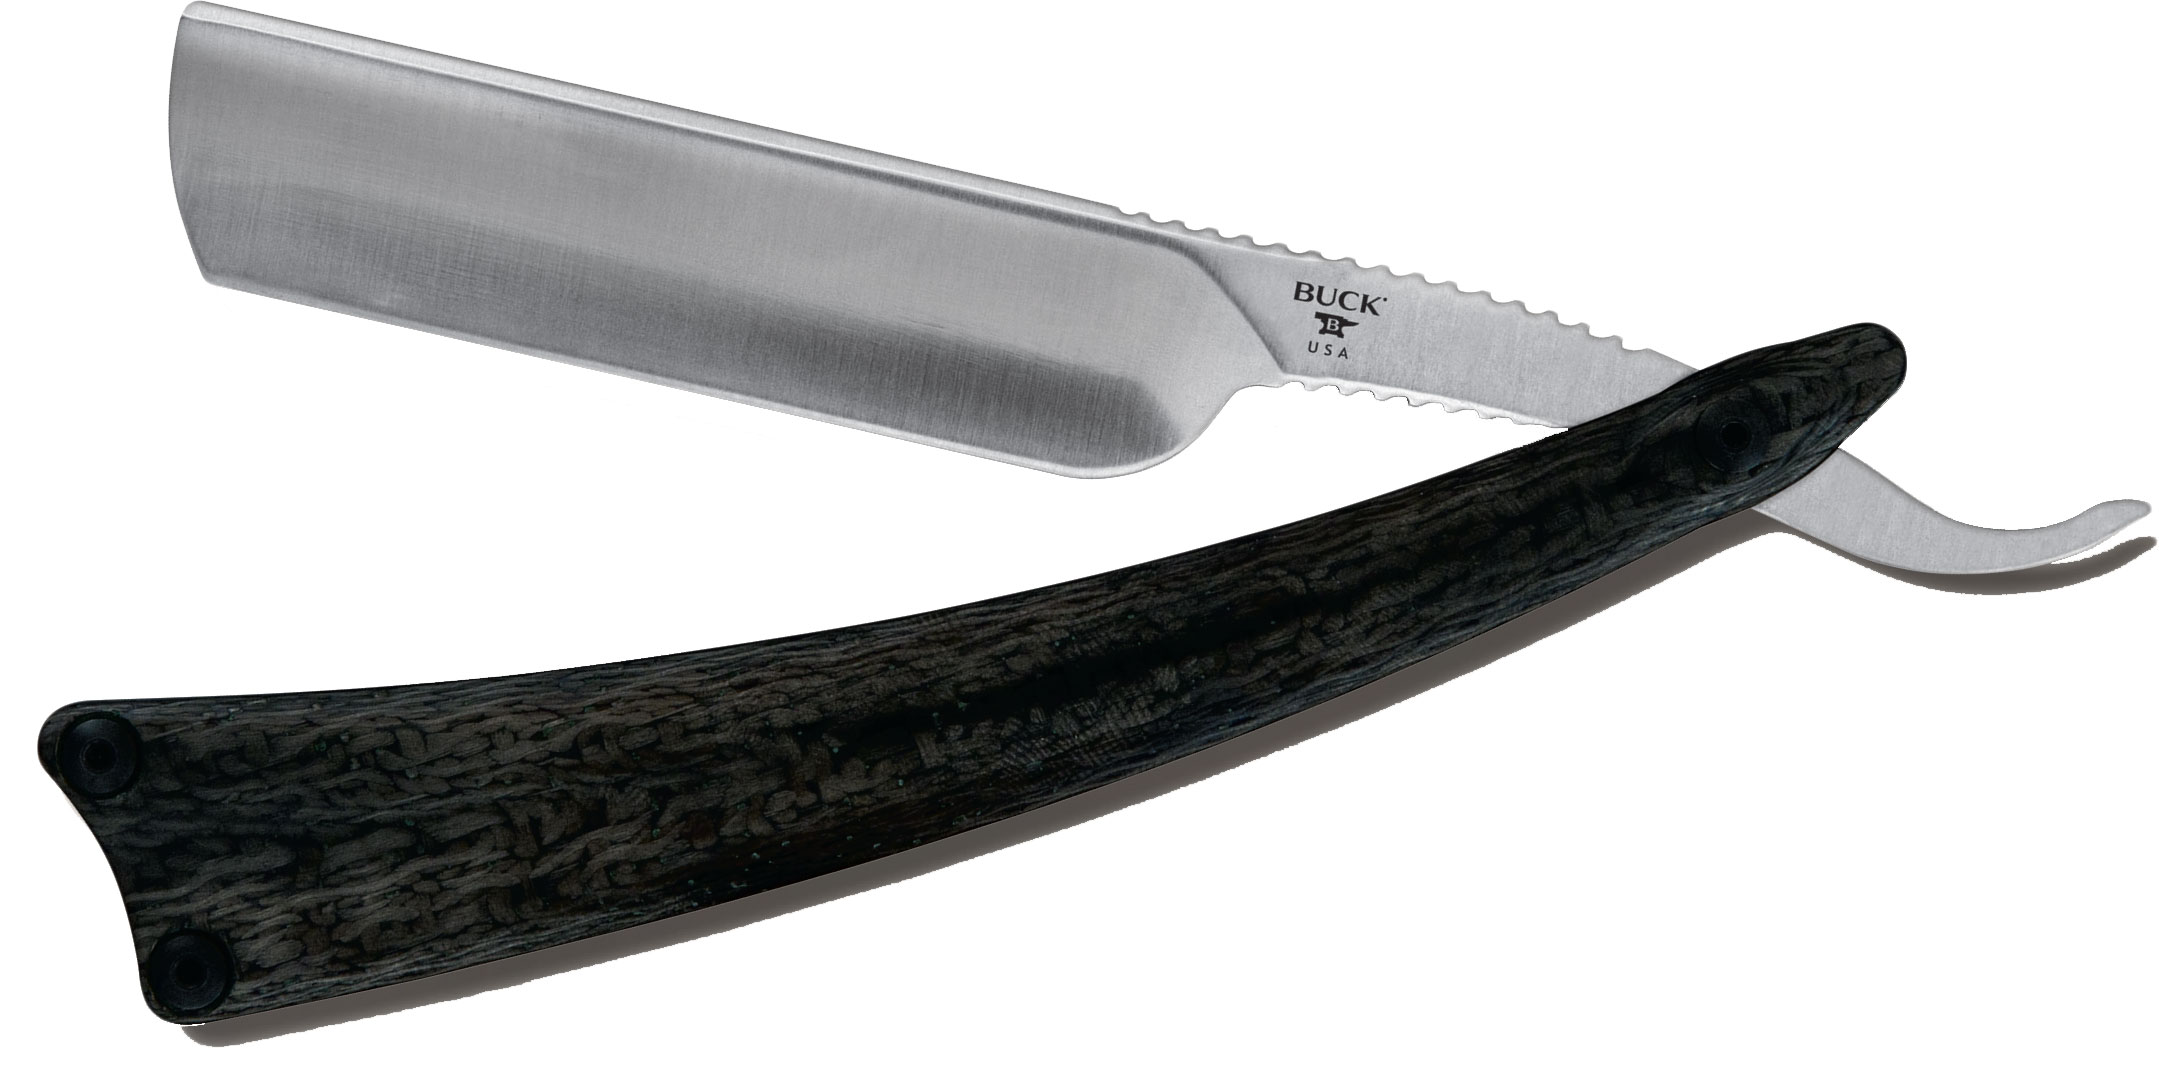 Buck 039 Legacy Collection Salient Straight Razor 2.75 inch Blade, Carbon Fiber Handles